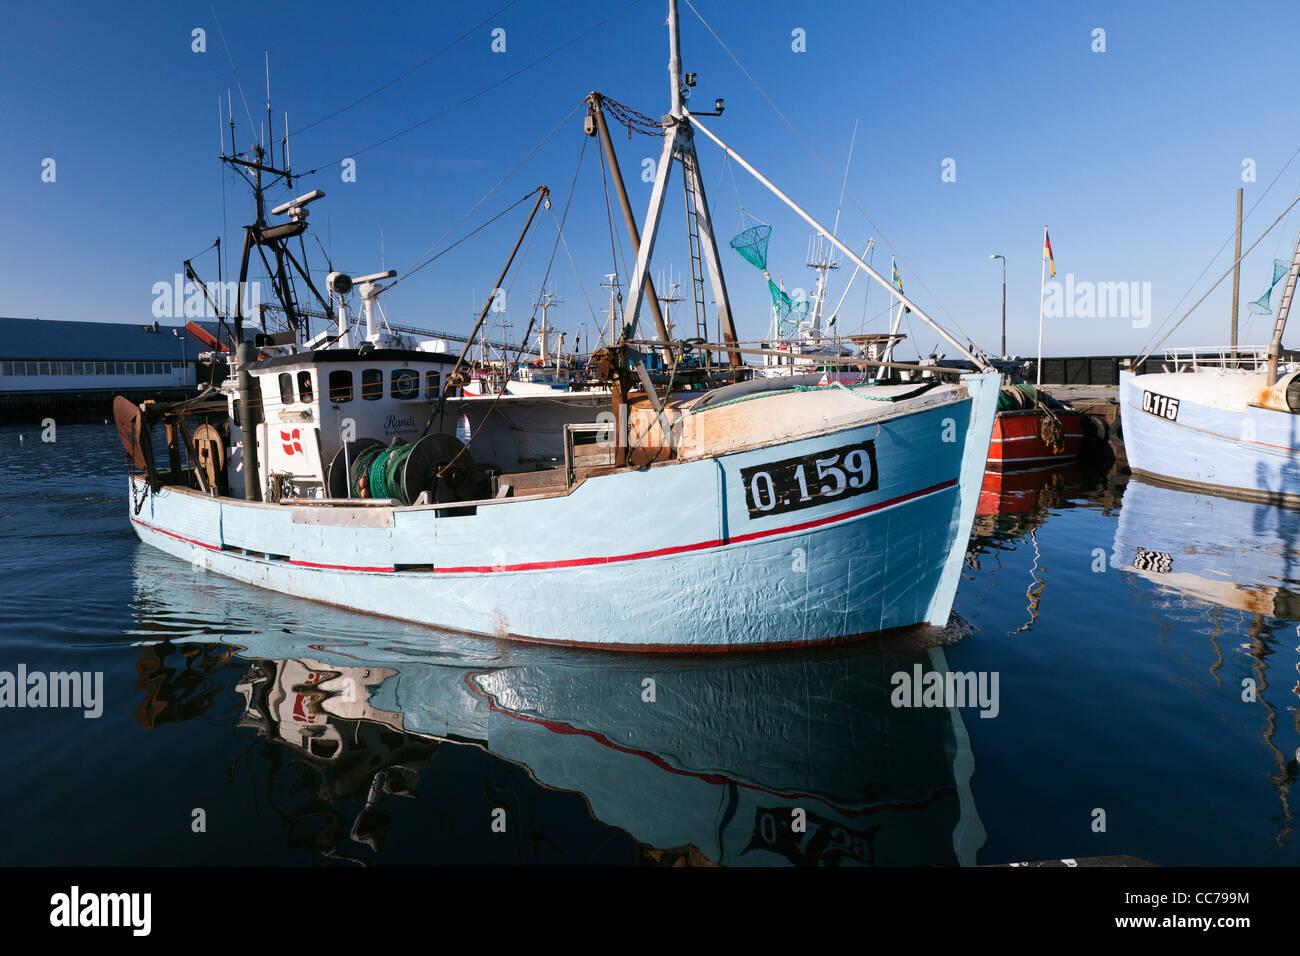 Fishing Boat, leaving the Harbour, Gilleleje, Sjaelland, Denmark Stock Photo